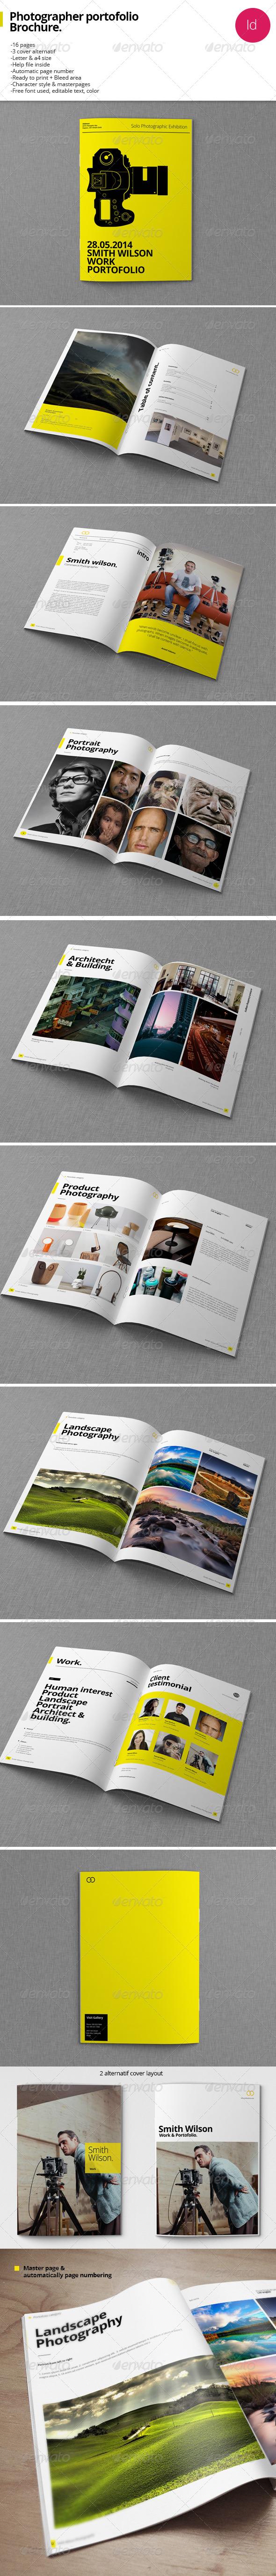 GraphicRiver 16 Pages Personal Photograph Portofolio 7902050